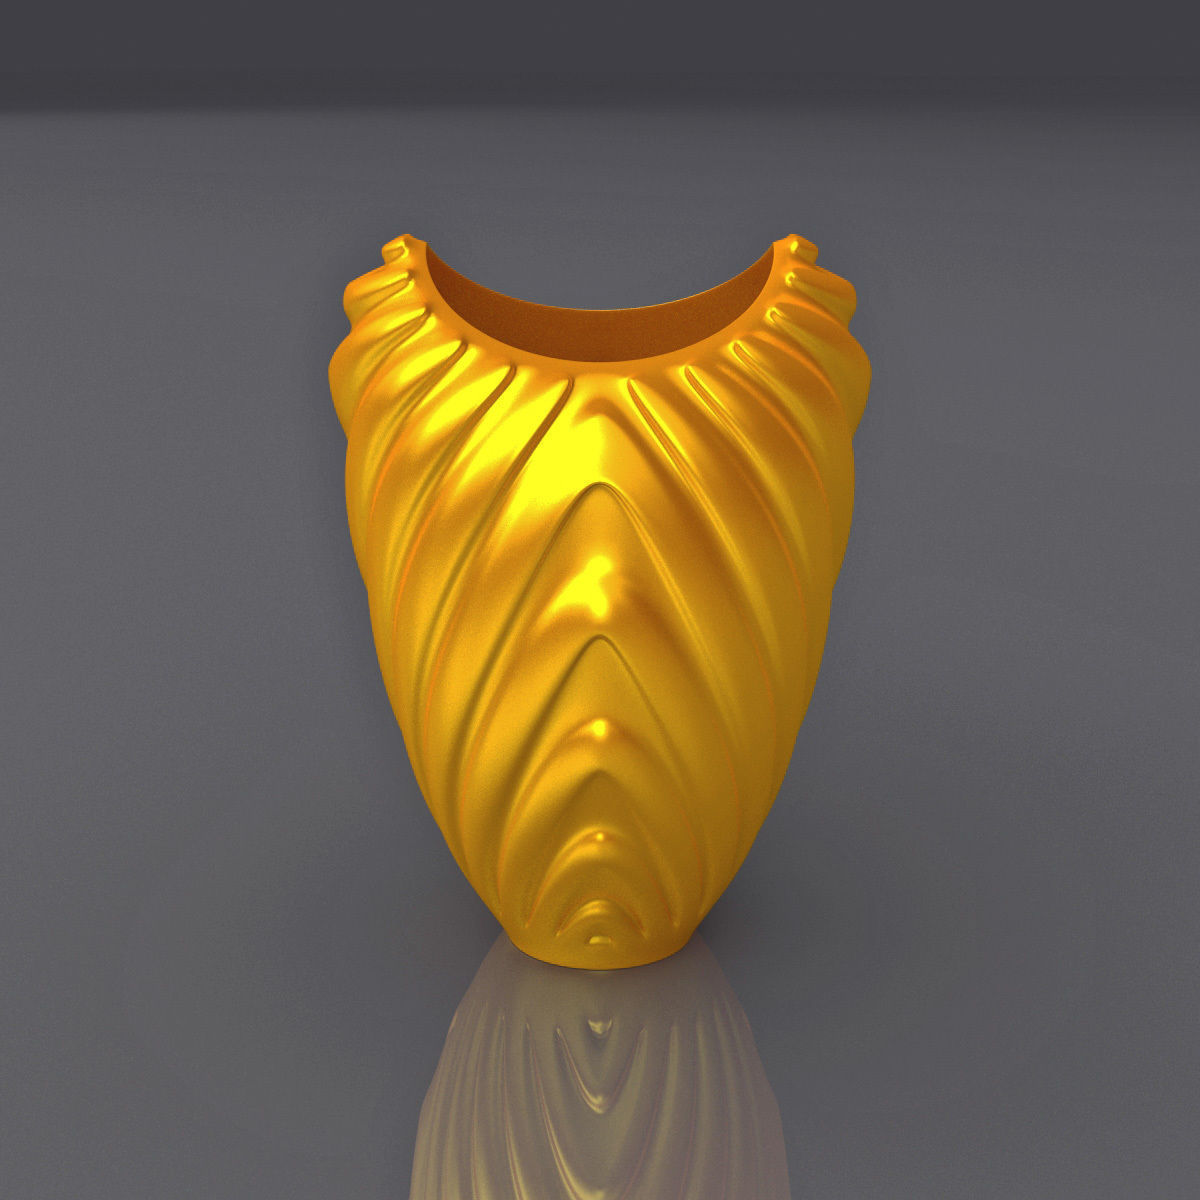 Wavy Pattern Vase Design 3D Print Model